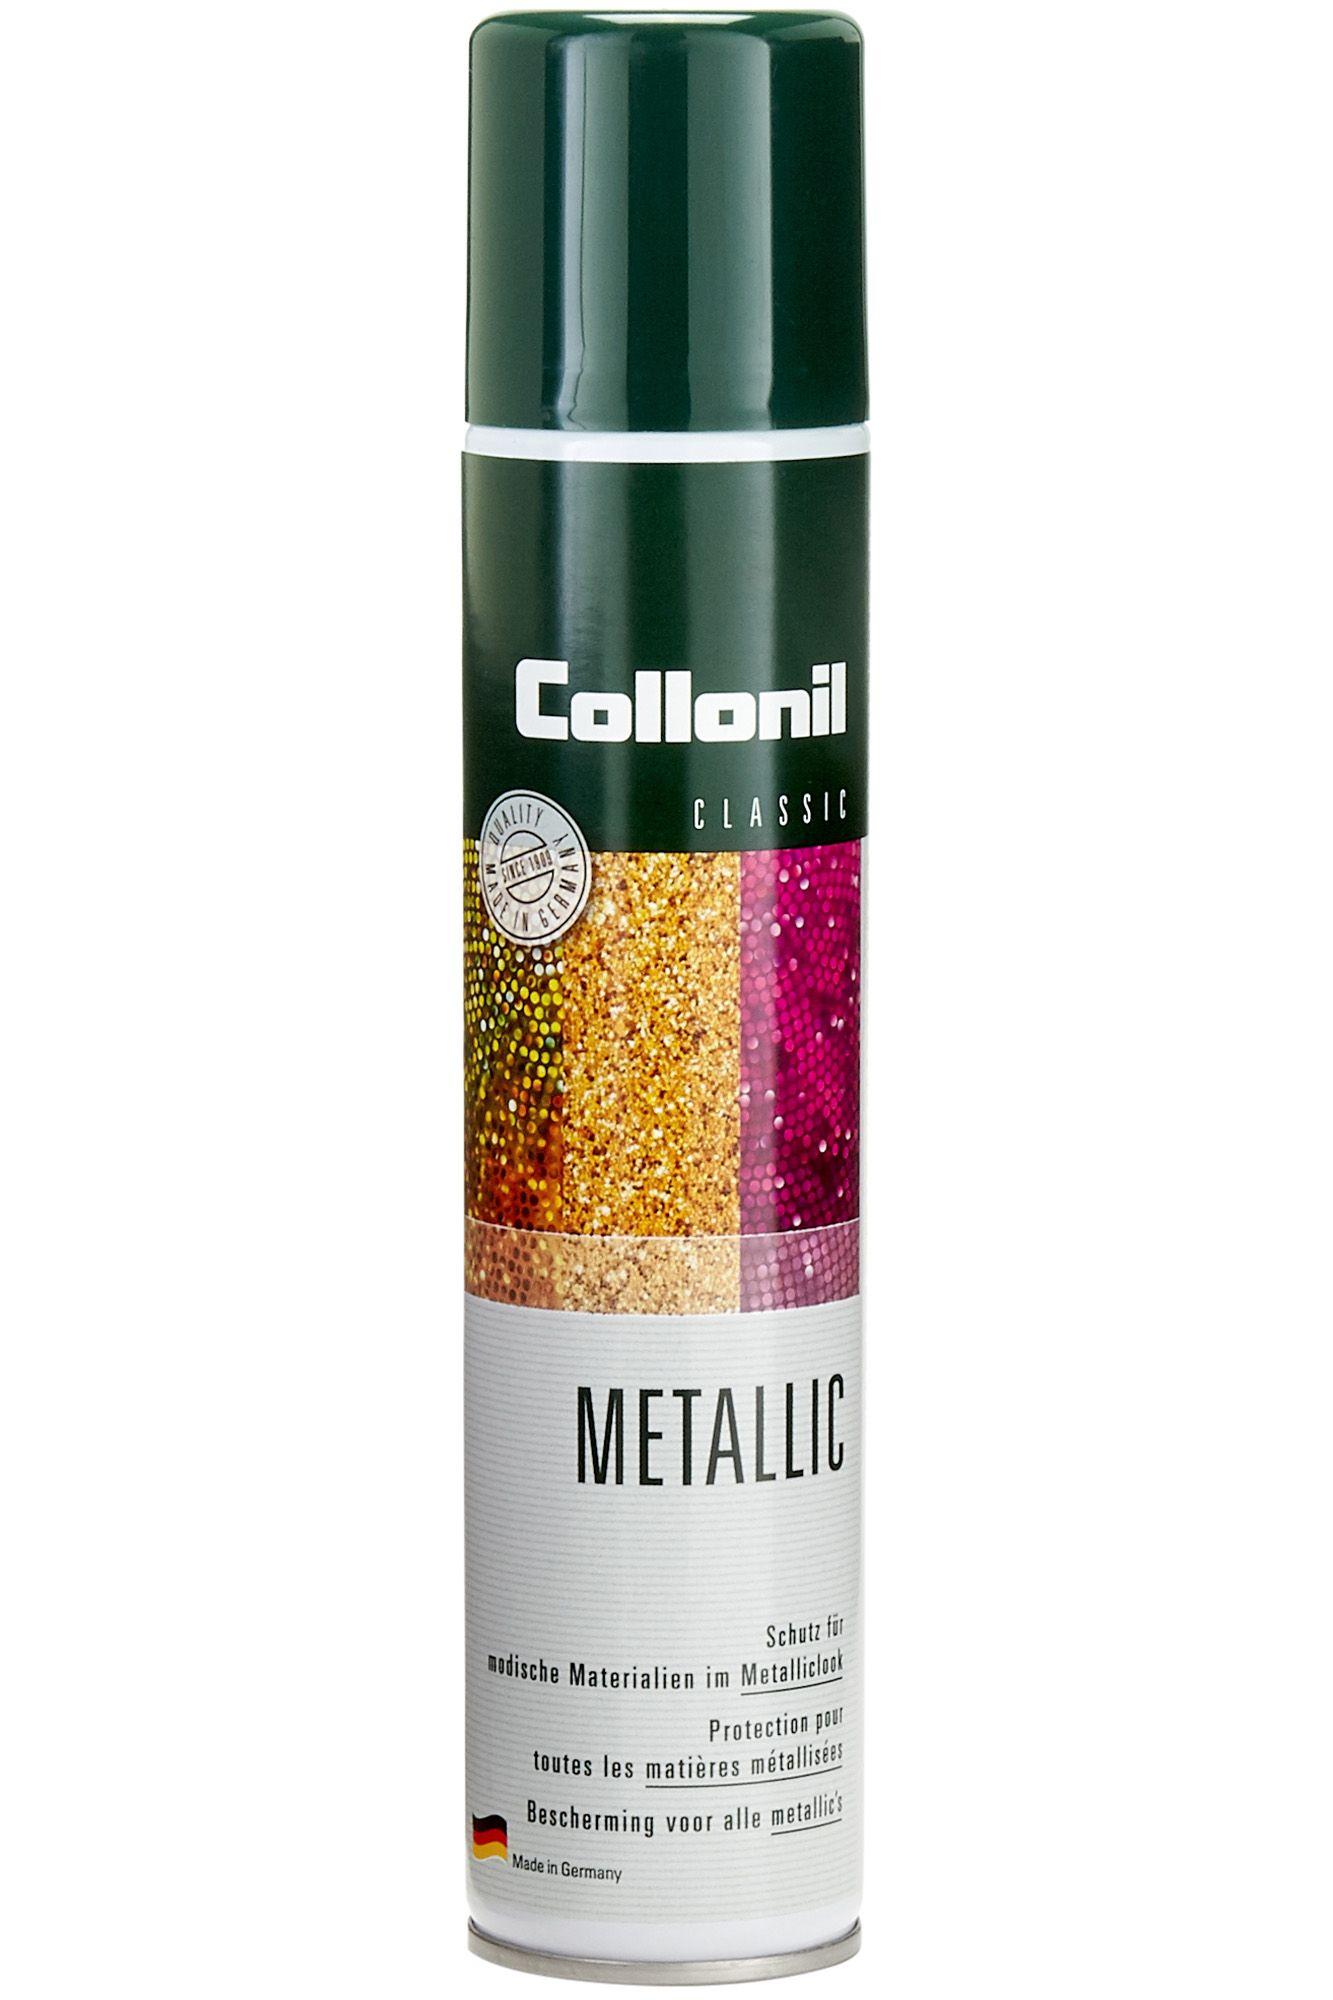 Collonil METALLIC - Imprägnierspray für Metallic-Leder